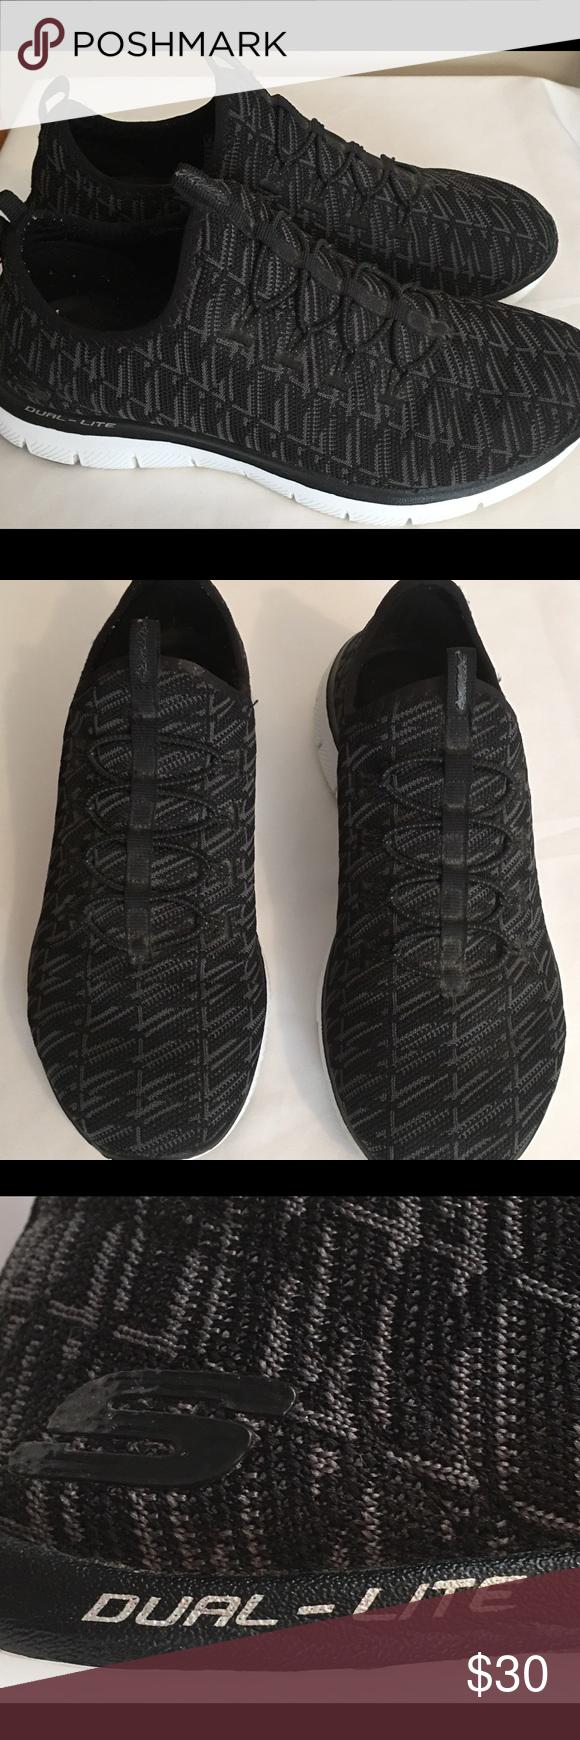 Skechers Dual-Lite Memory Foam Slip